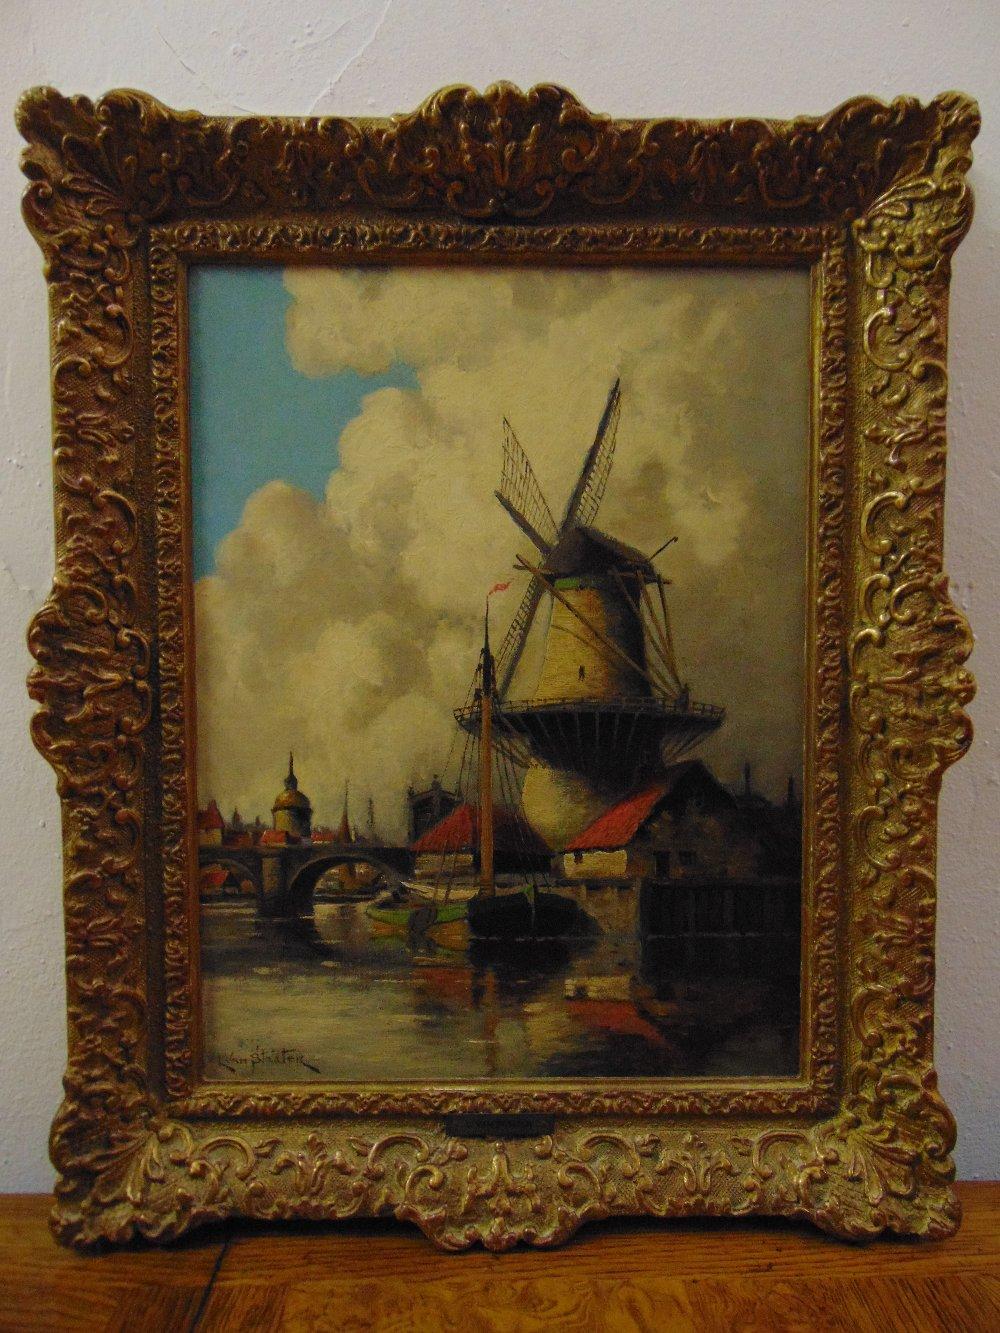 Lot 83 - Louis van Staaten (Hermanus II Koekoek) framed oil on panel of a Dutch windmill with a barge by a